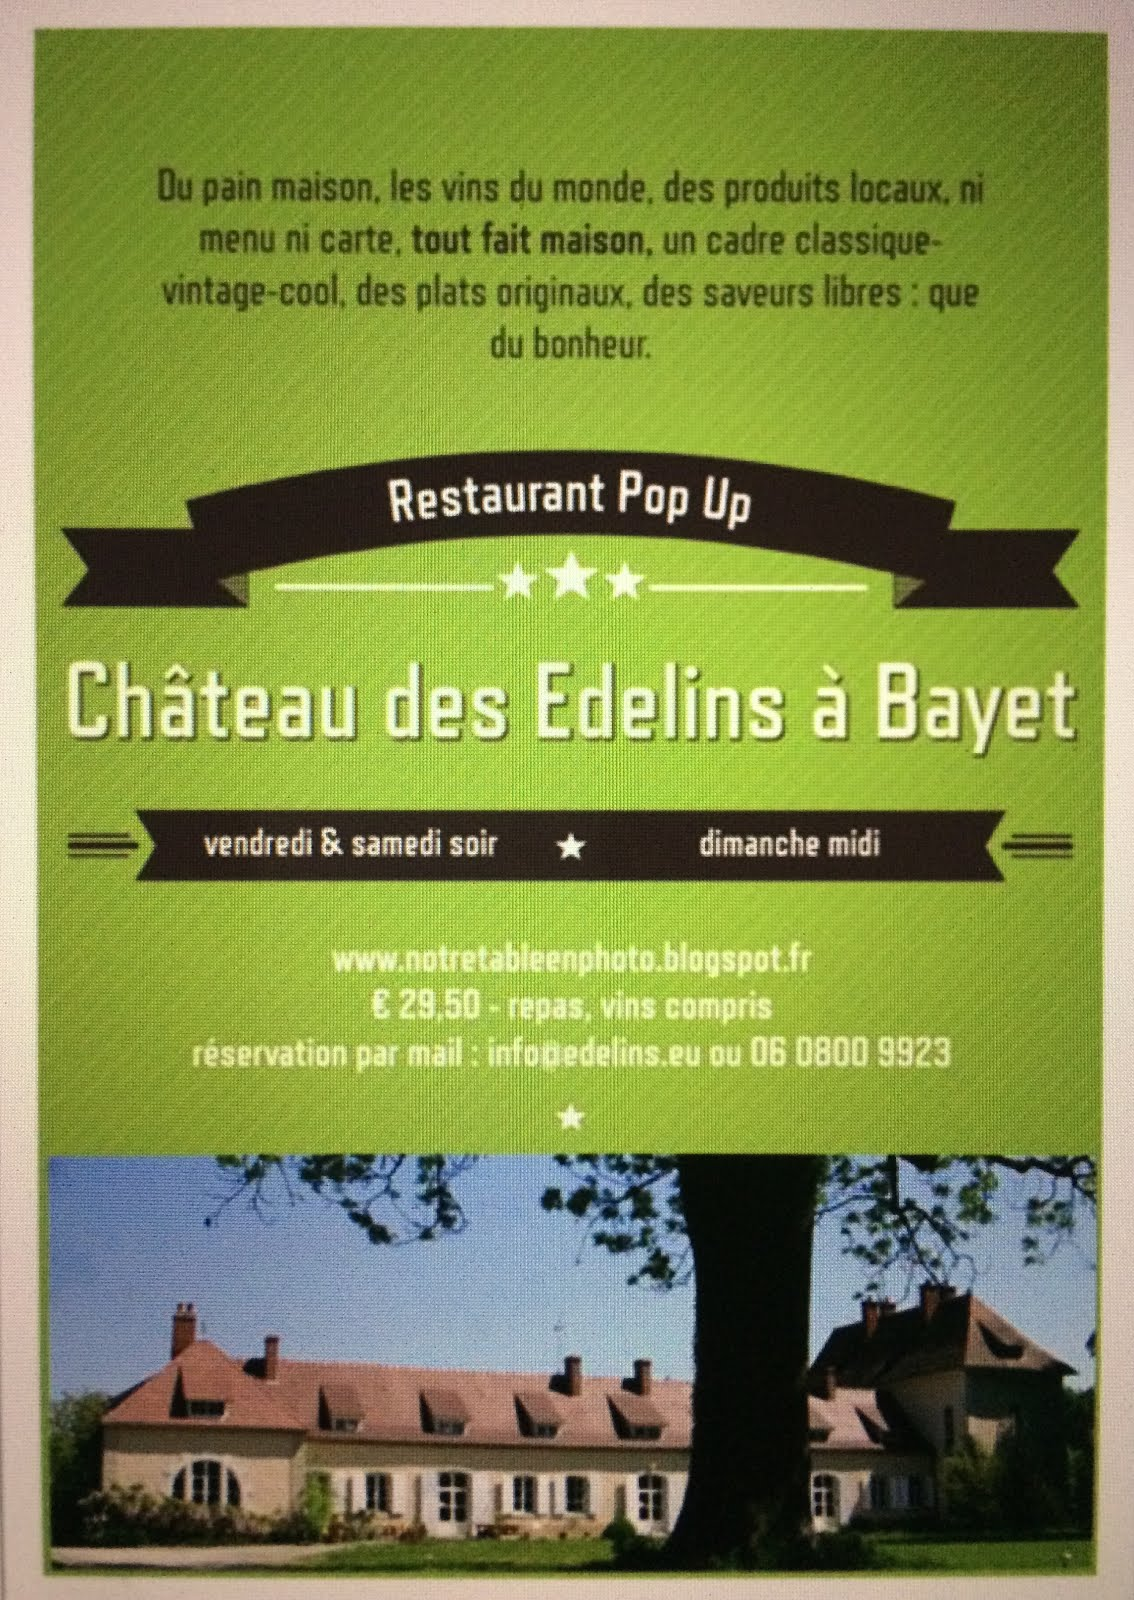 Bienvenue au Château